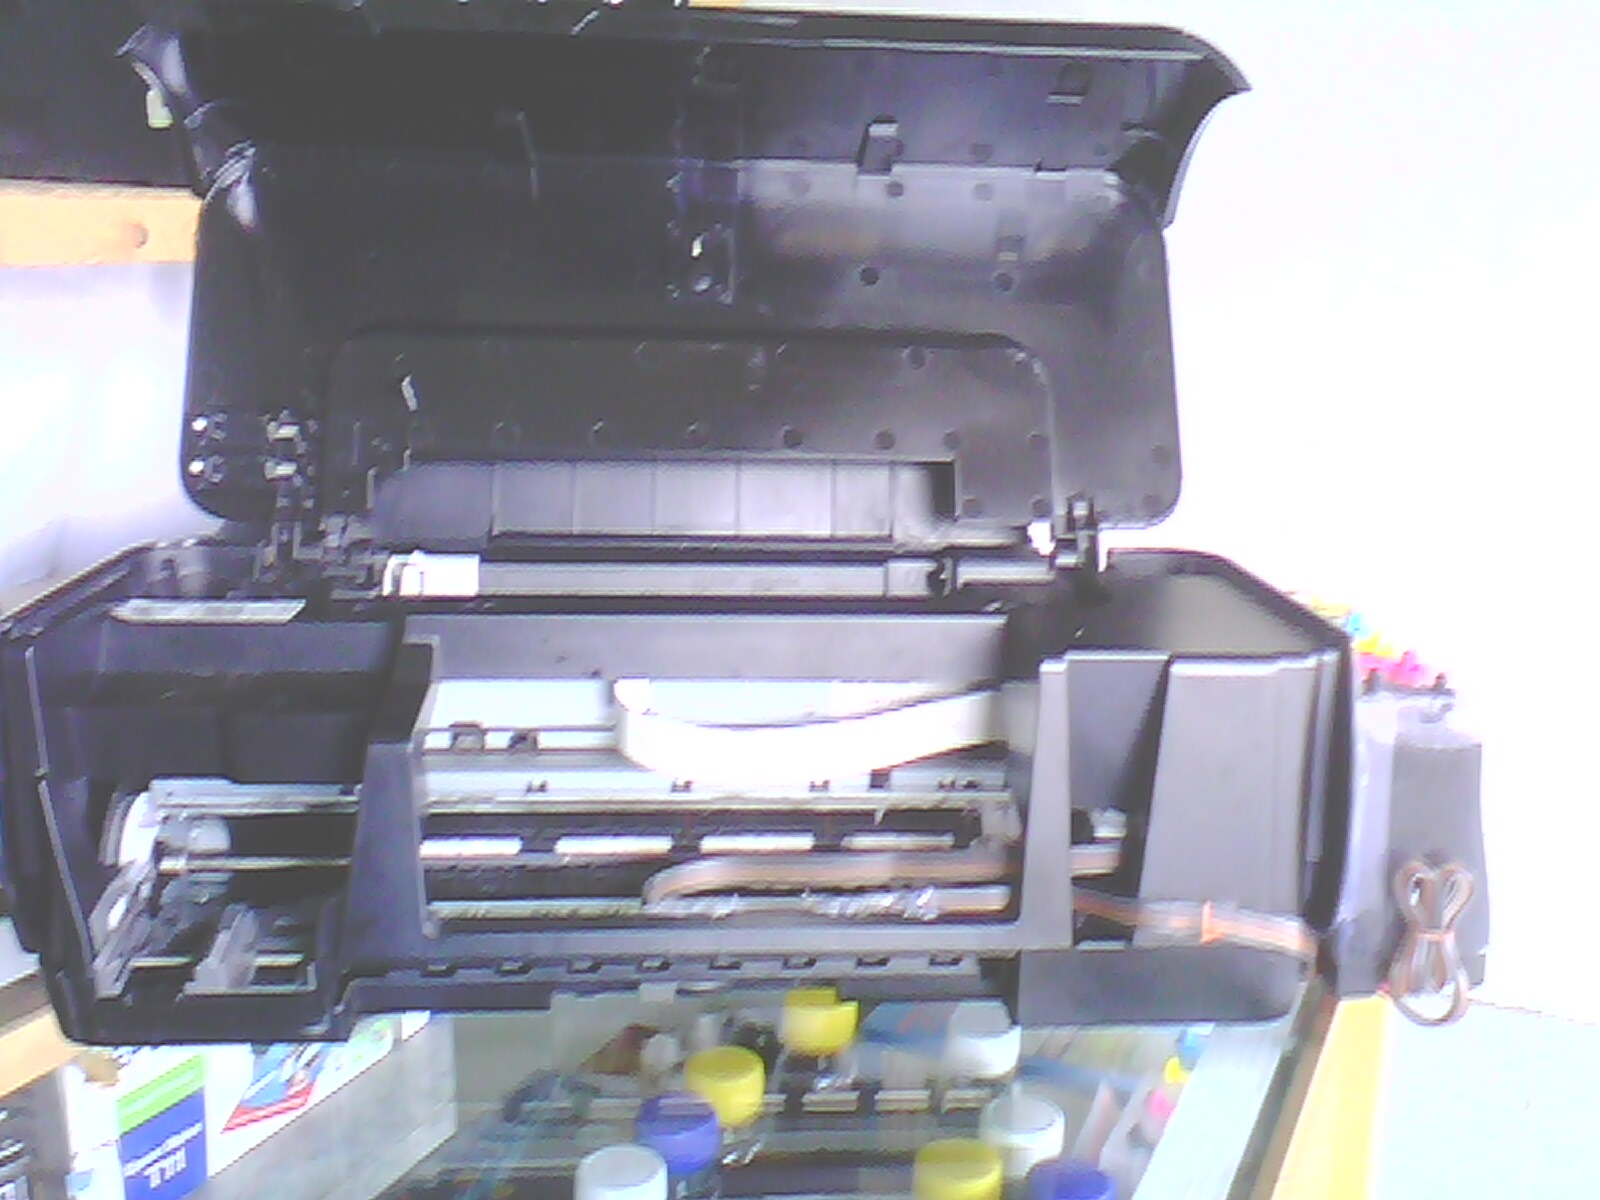 Printer Bekas Canon Ip1880 Service Laptop Servis Bergaransi Pg 40 Kondisi 90 Ok Sudah Terpasng Infus Tinta Penuh Terpasang Tabung Pembuang Catrit Hitam Pg40